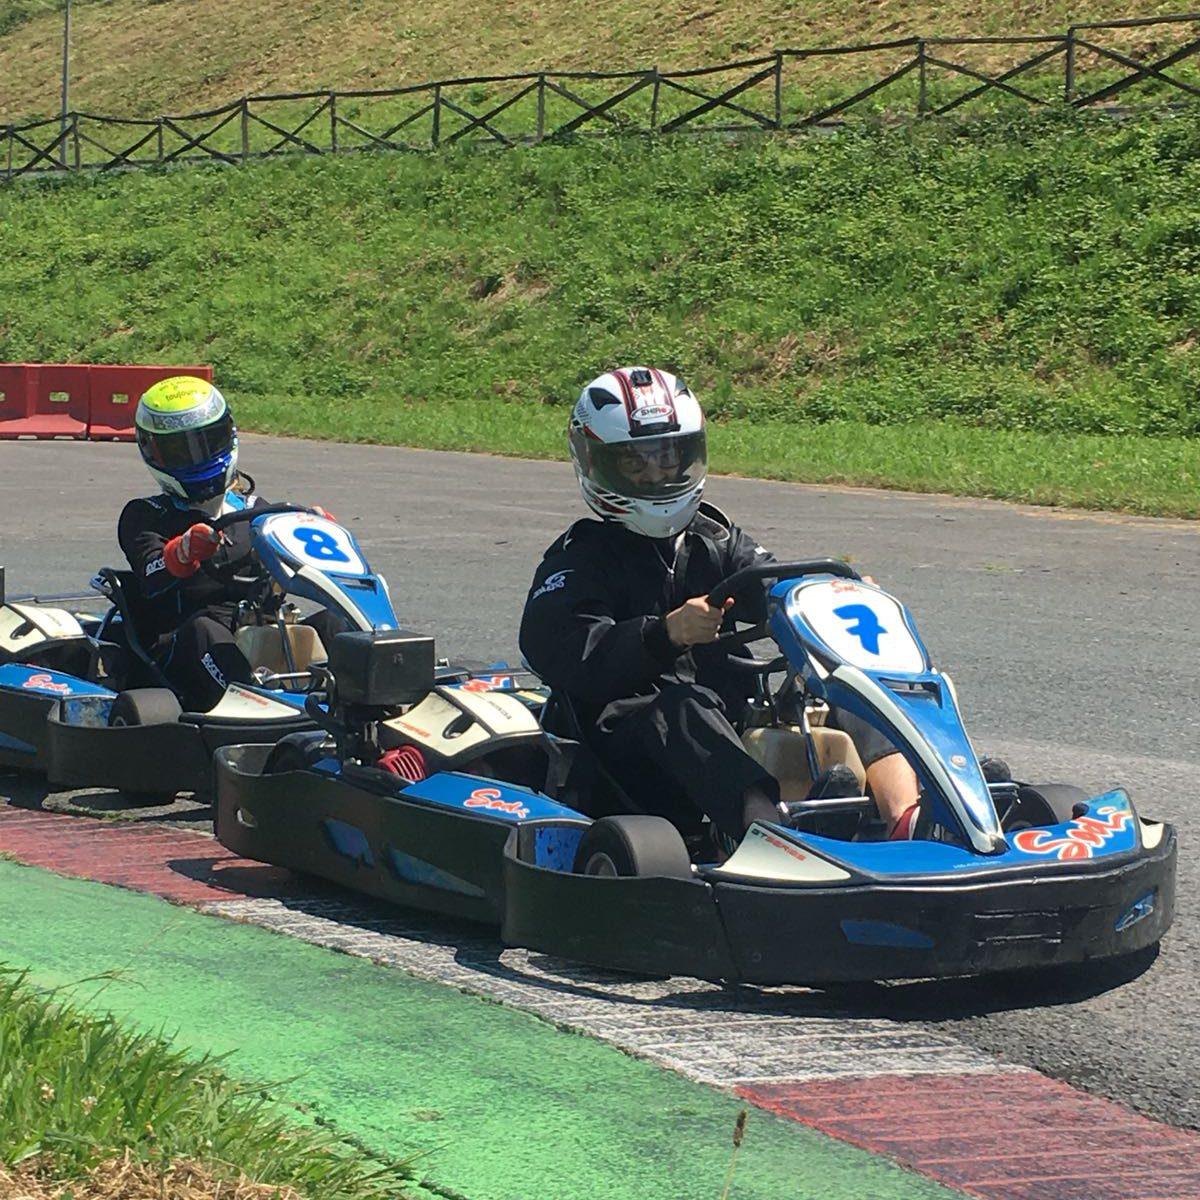 Circuito Karting : Cursos de karting circuito karting olaberria vilariÑo motorsport